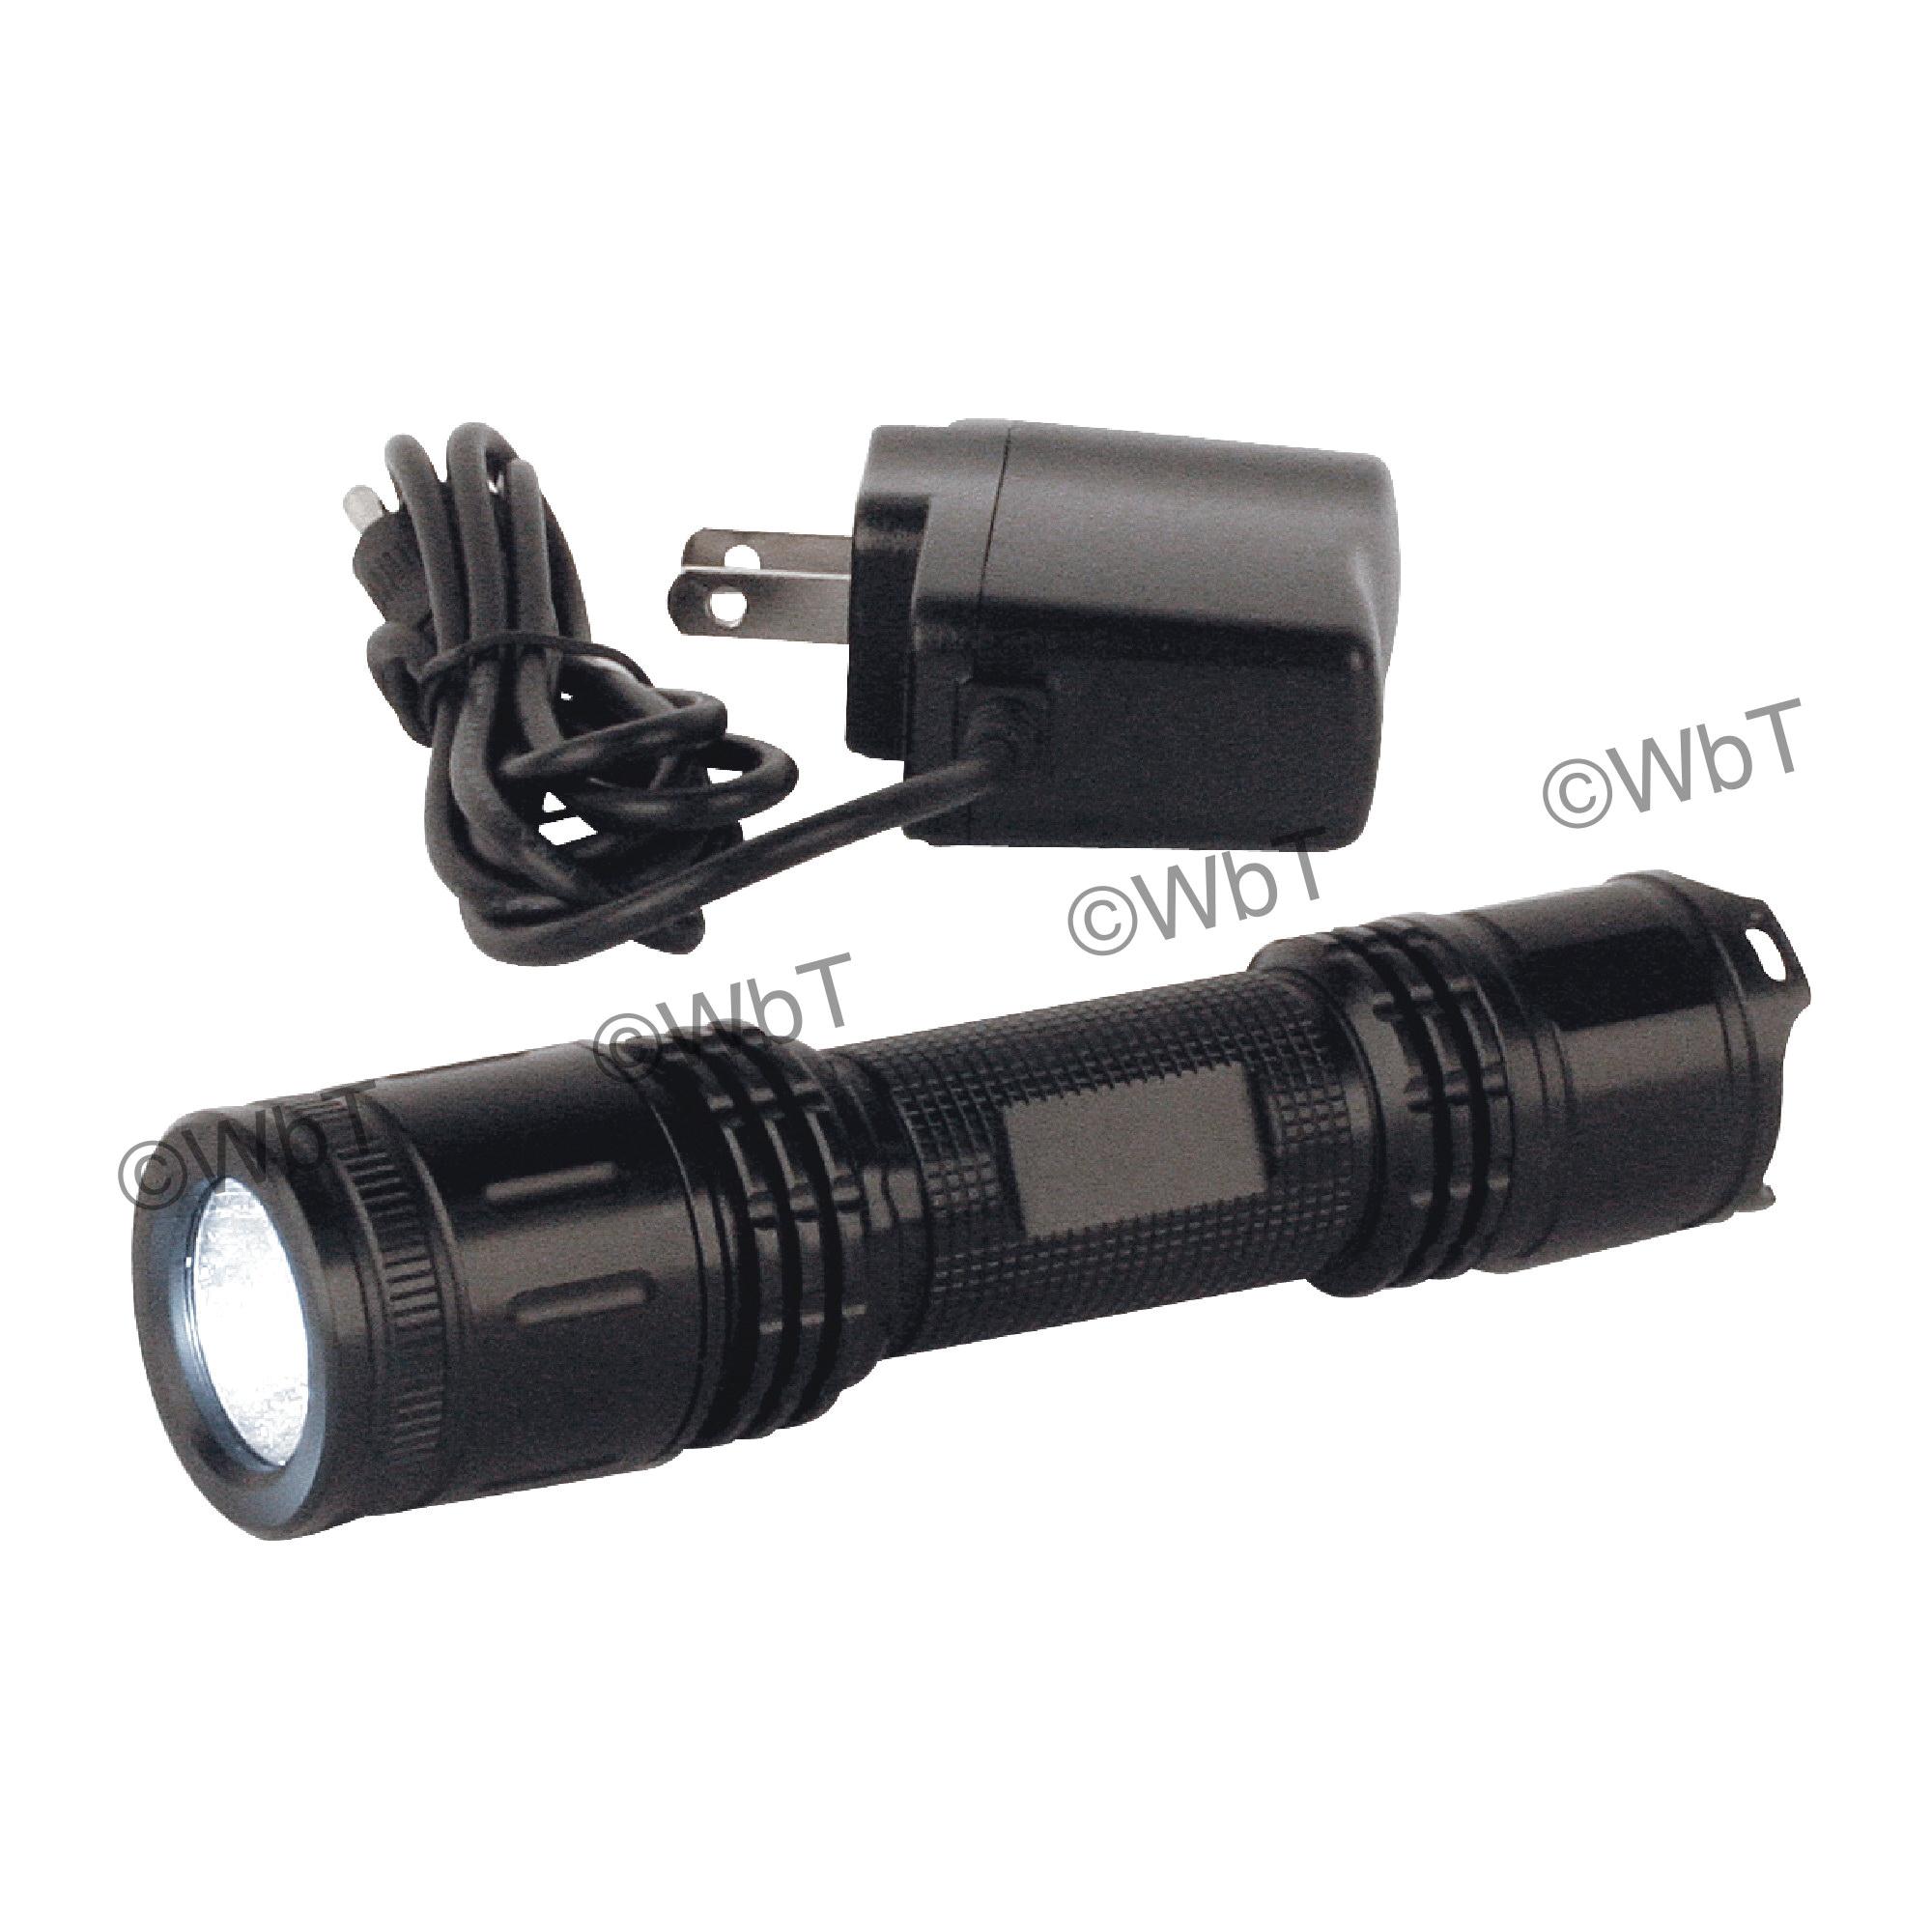 TTC 96-004-645 High Strength Flashlight, 3 W, LED Bulb, 200 Lumens Lumens